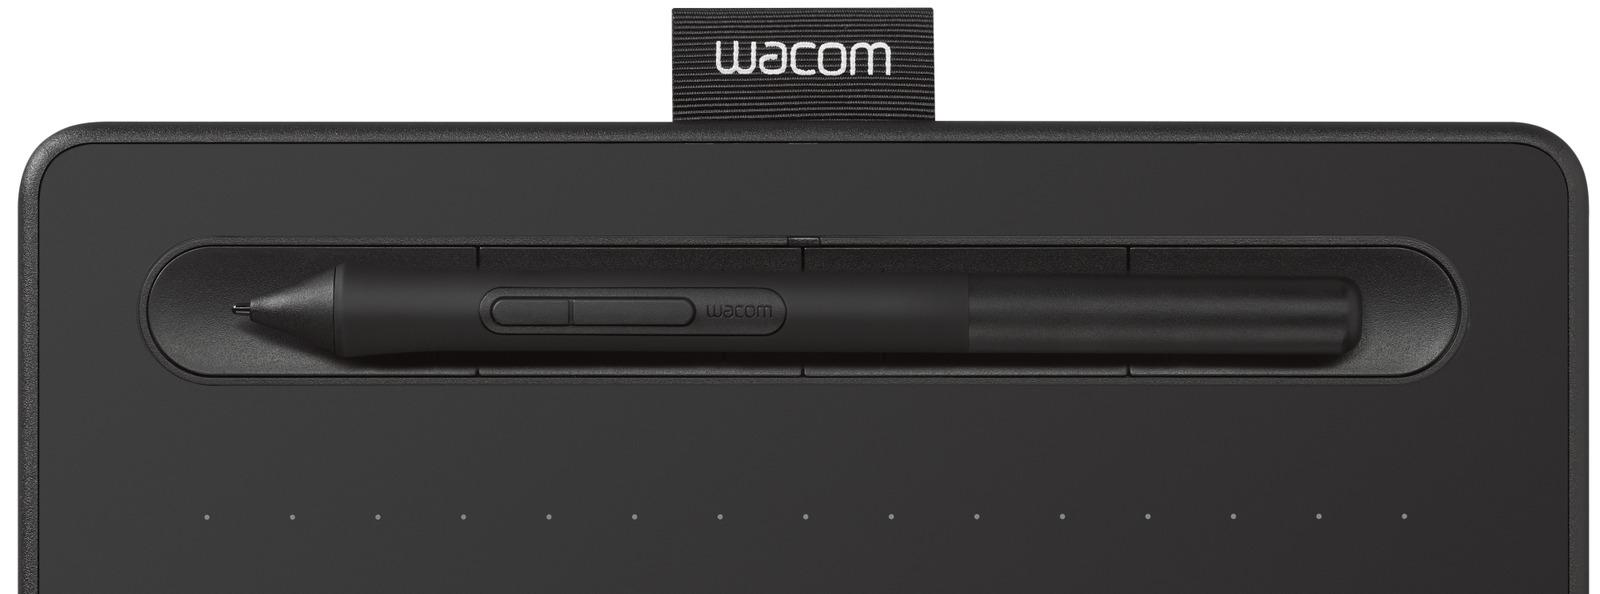 Wacom Intuos Small Black image